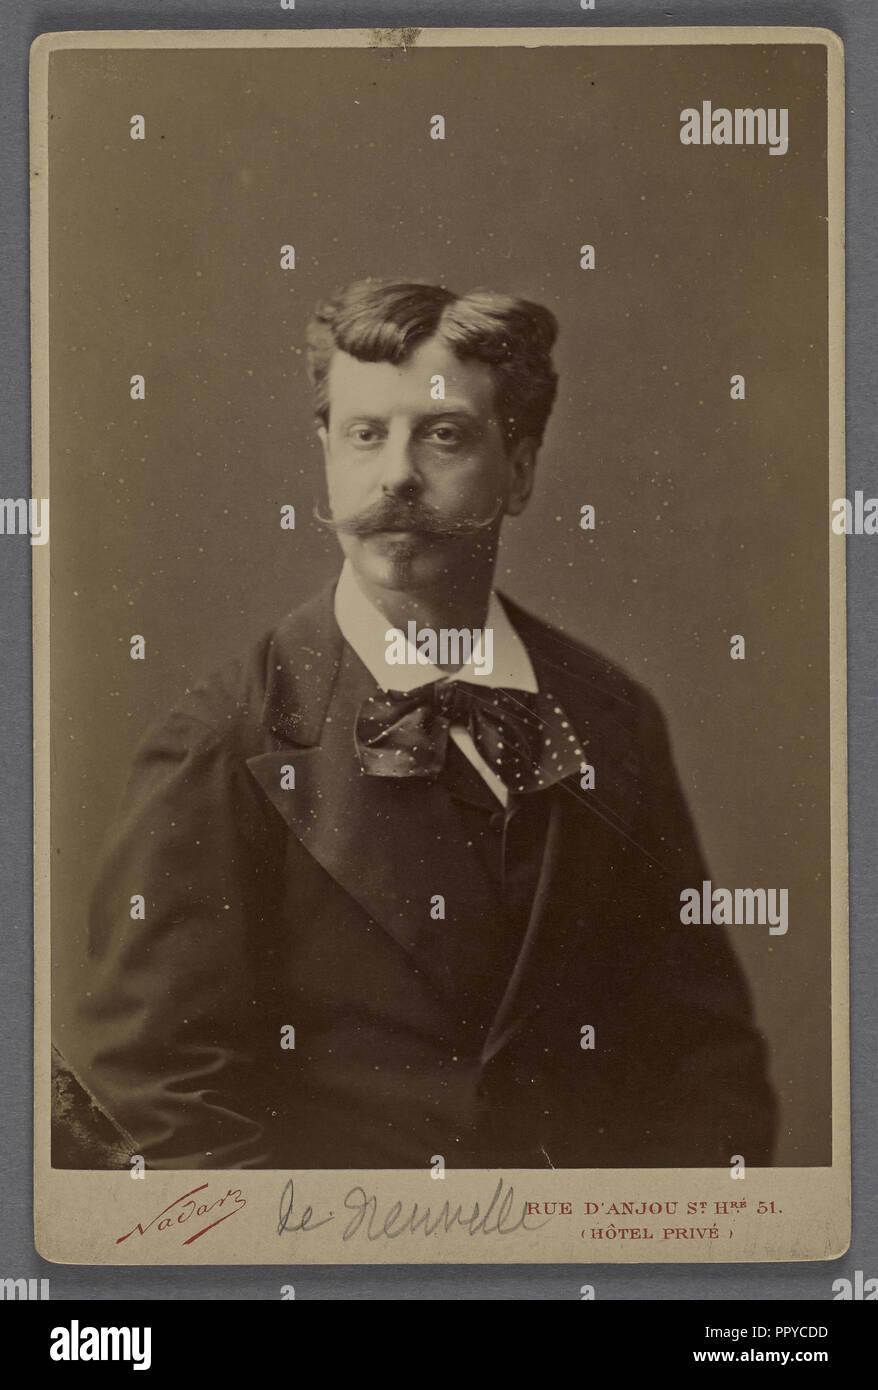 de Neuville, peintre; Nadar, Gaspard Félix Tournachon, French, 1820 - 1910, Paul Nadar, French, 1856 - 1939, 1878 - 1885 - Stock Image